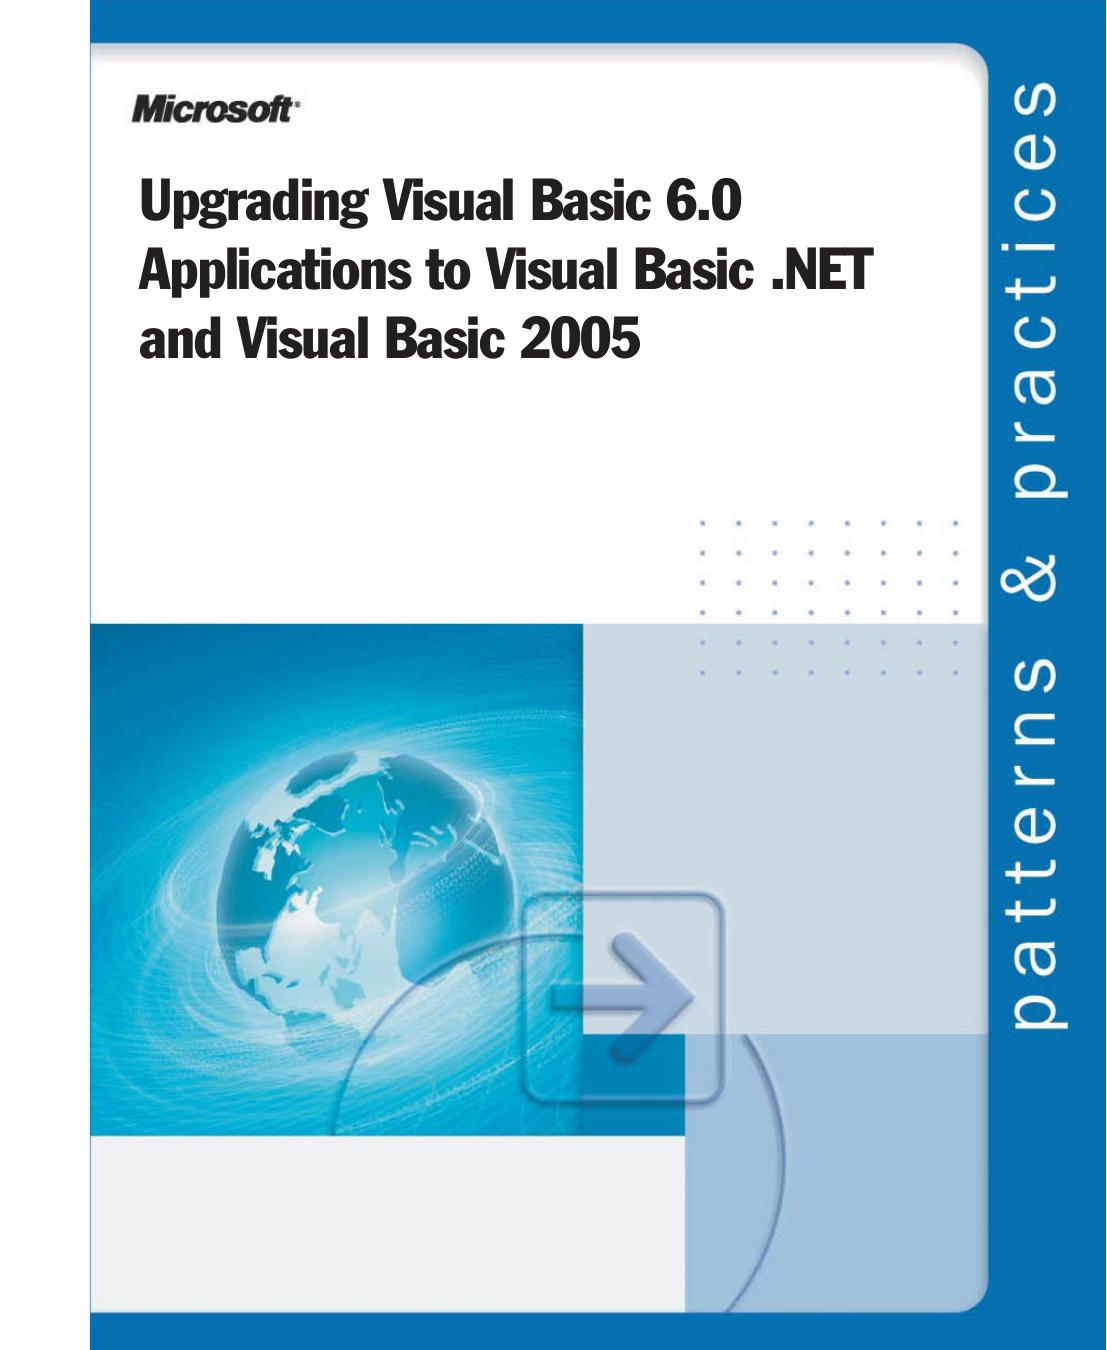 Upgrading Visual Basic 6 0 Applications to Visual Basic  NET and